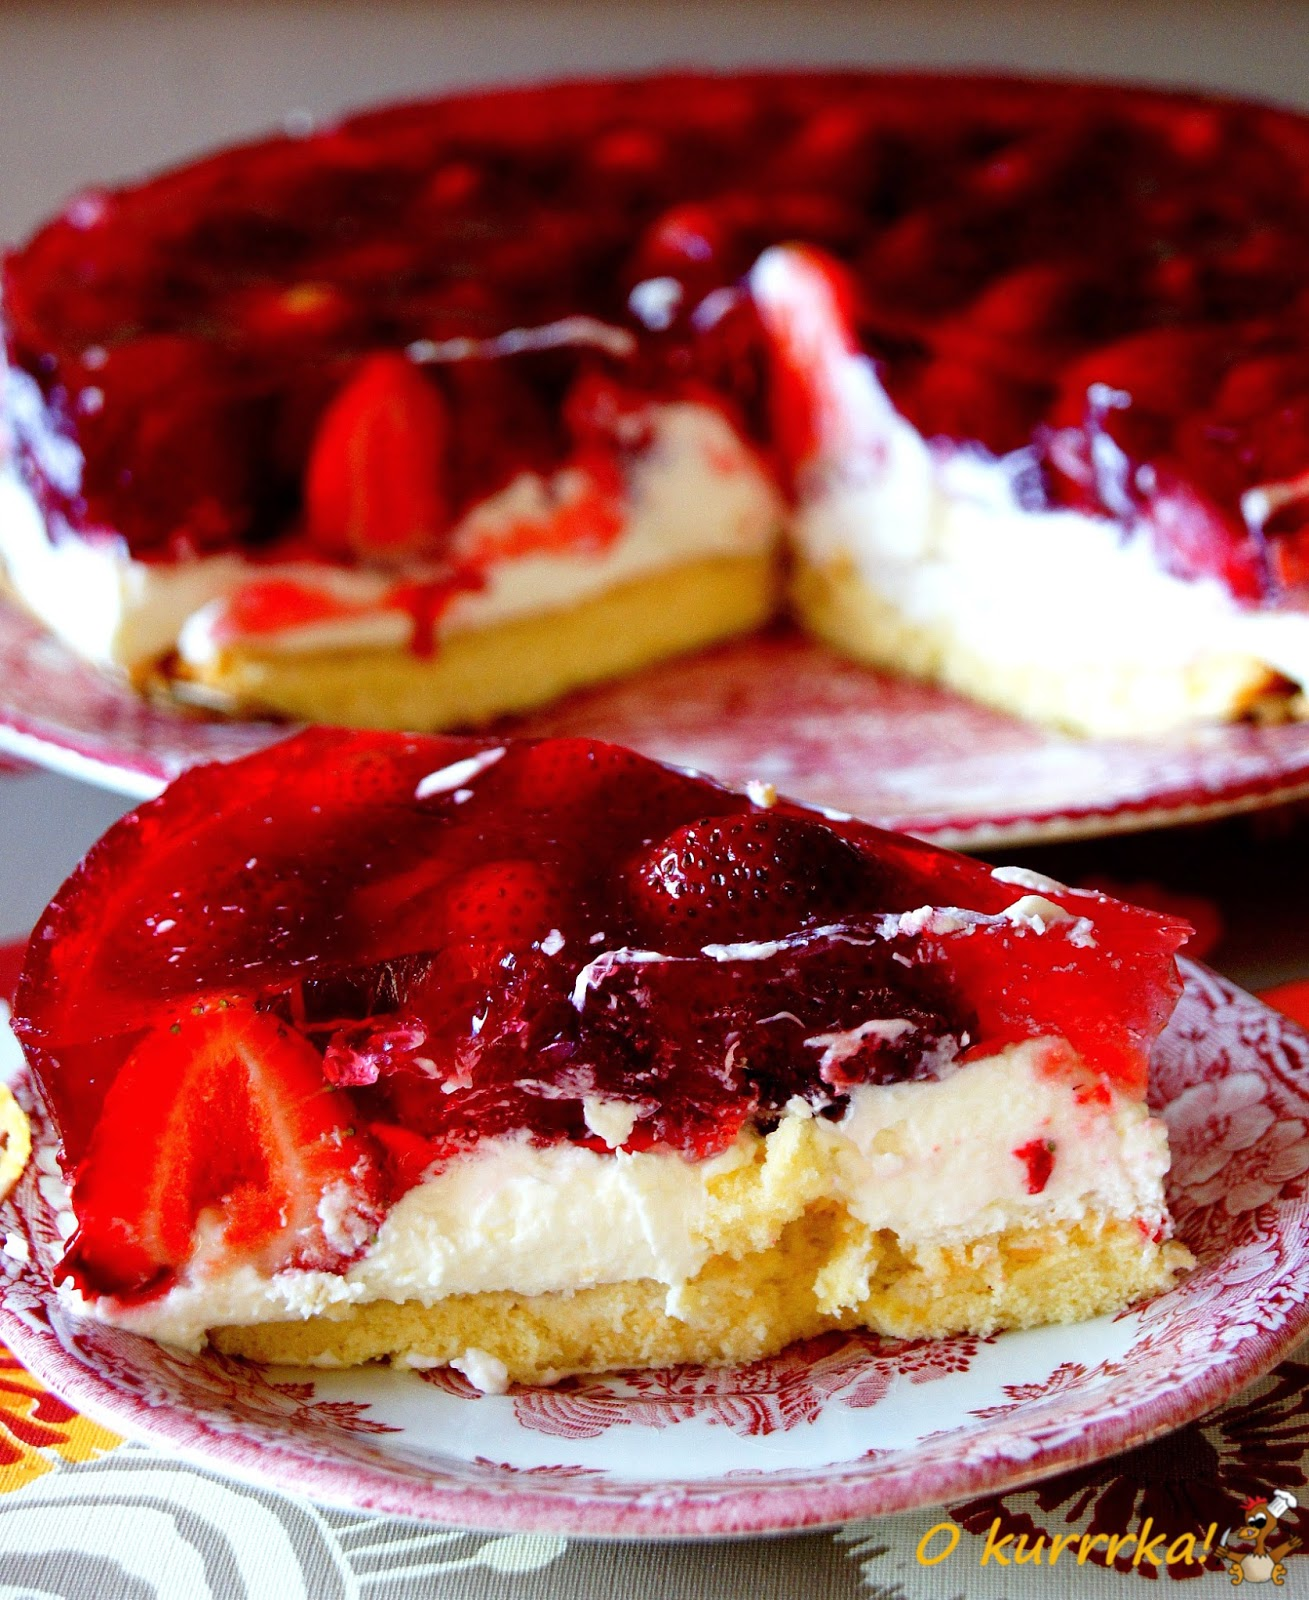 Poland Cake: Okurrrka! English: Strawberry Sponge-cake With Cream And Jelly